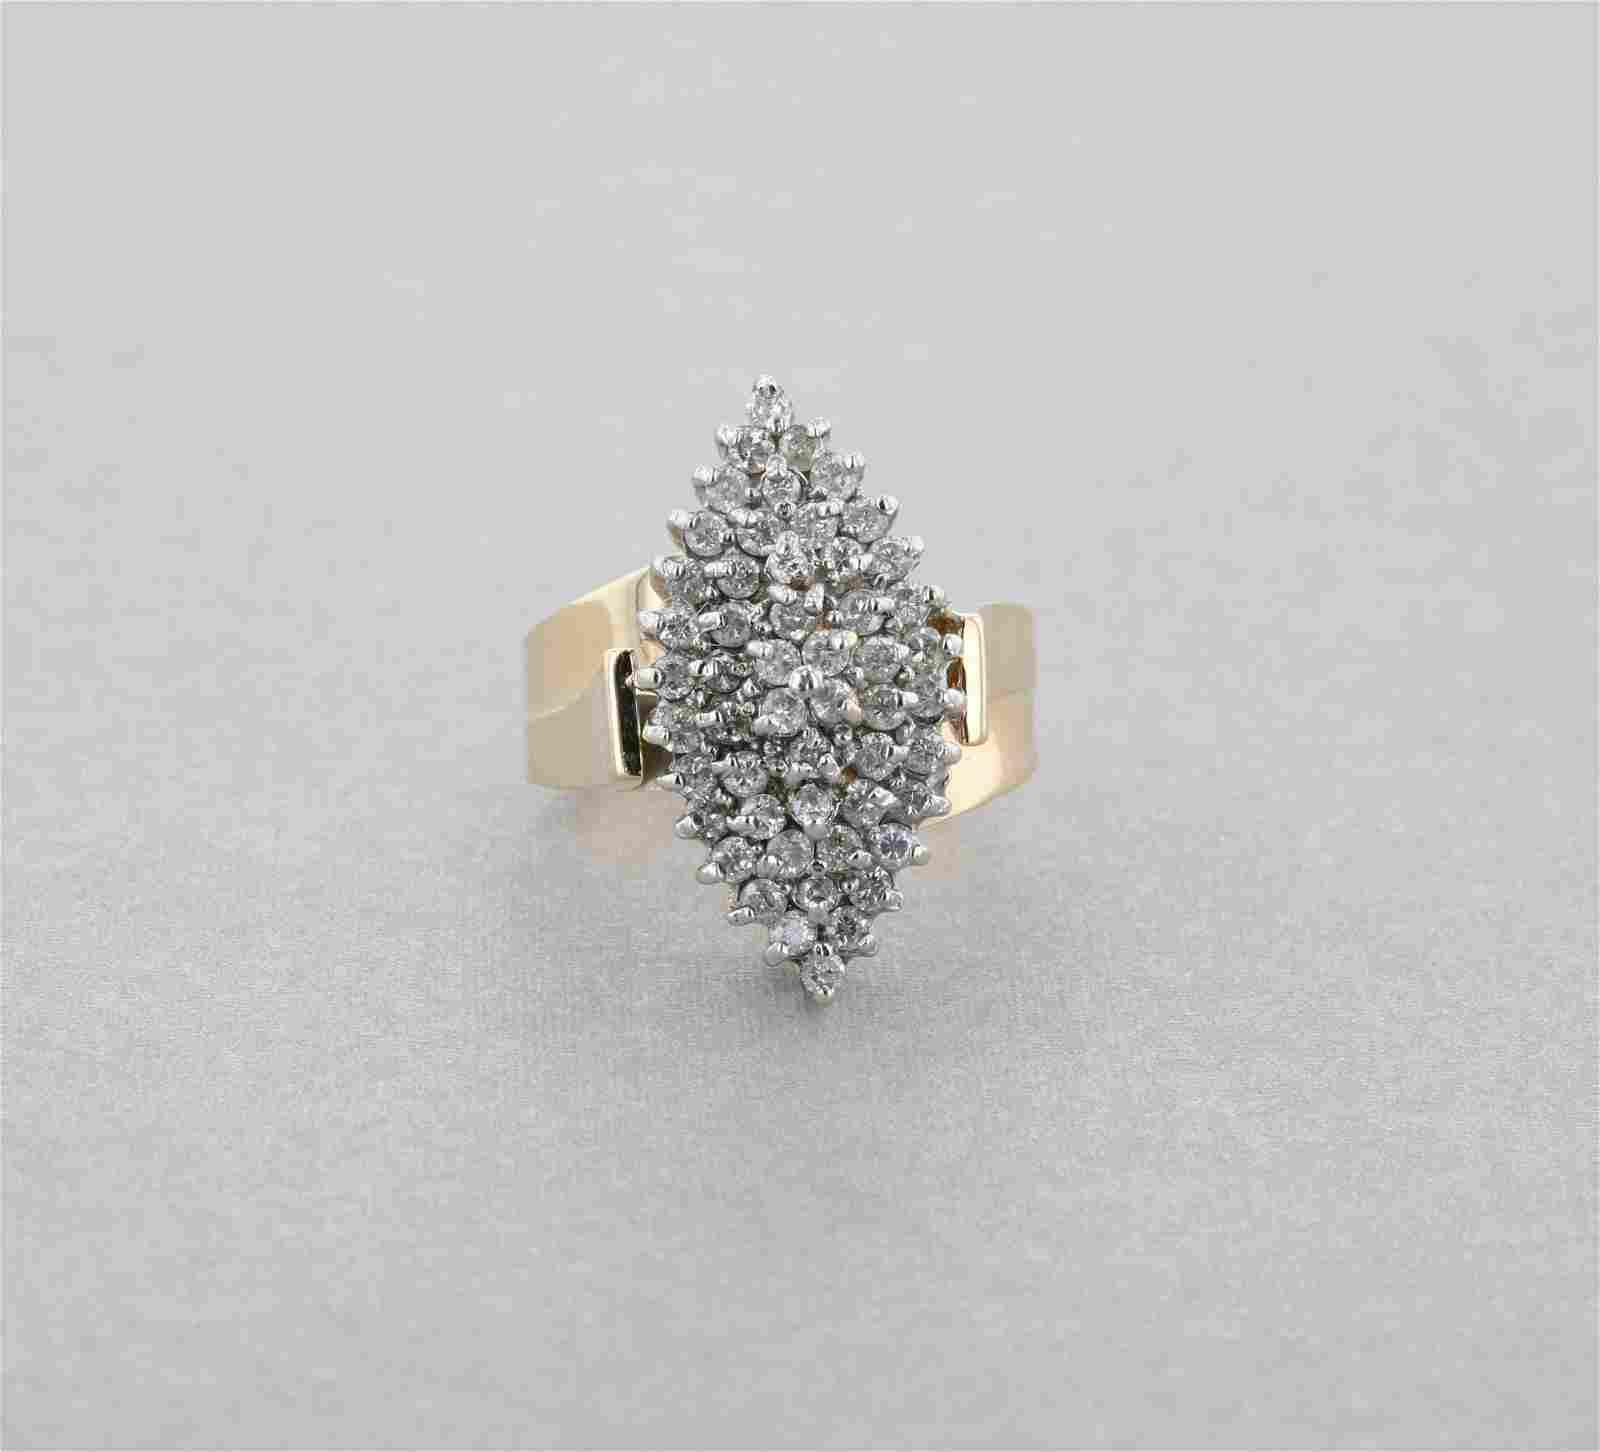 Large 14K Yellow Gold Statement Diamond Ring